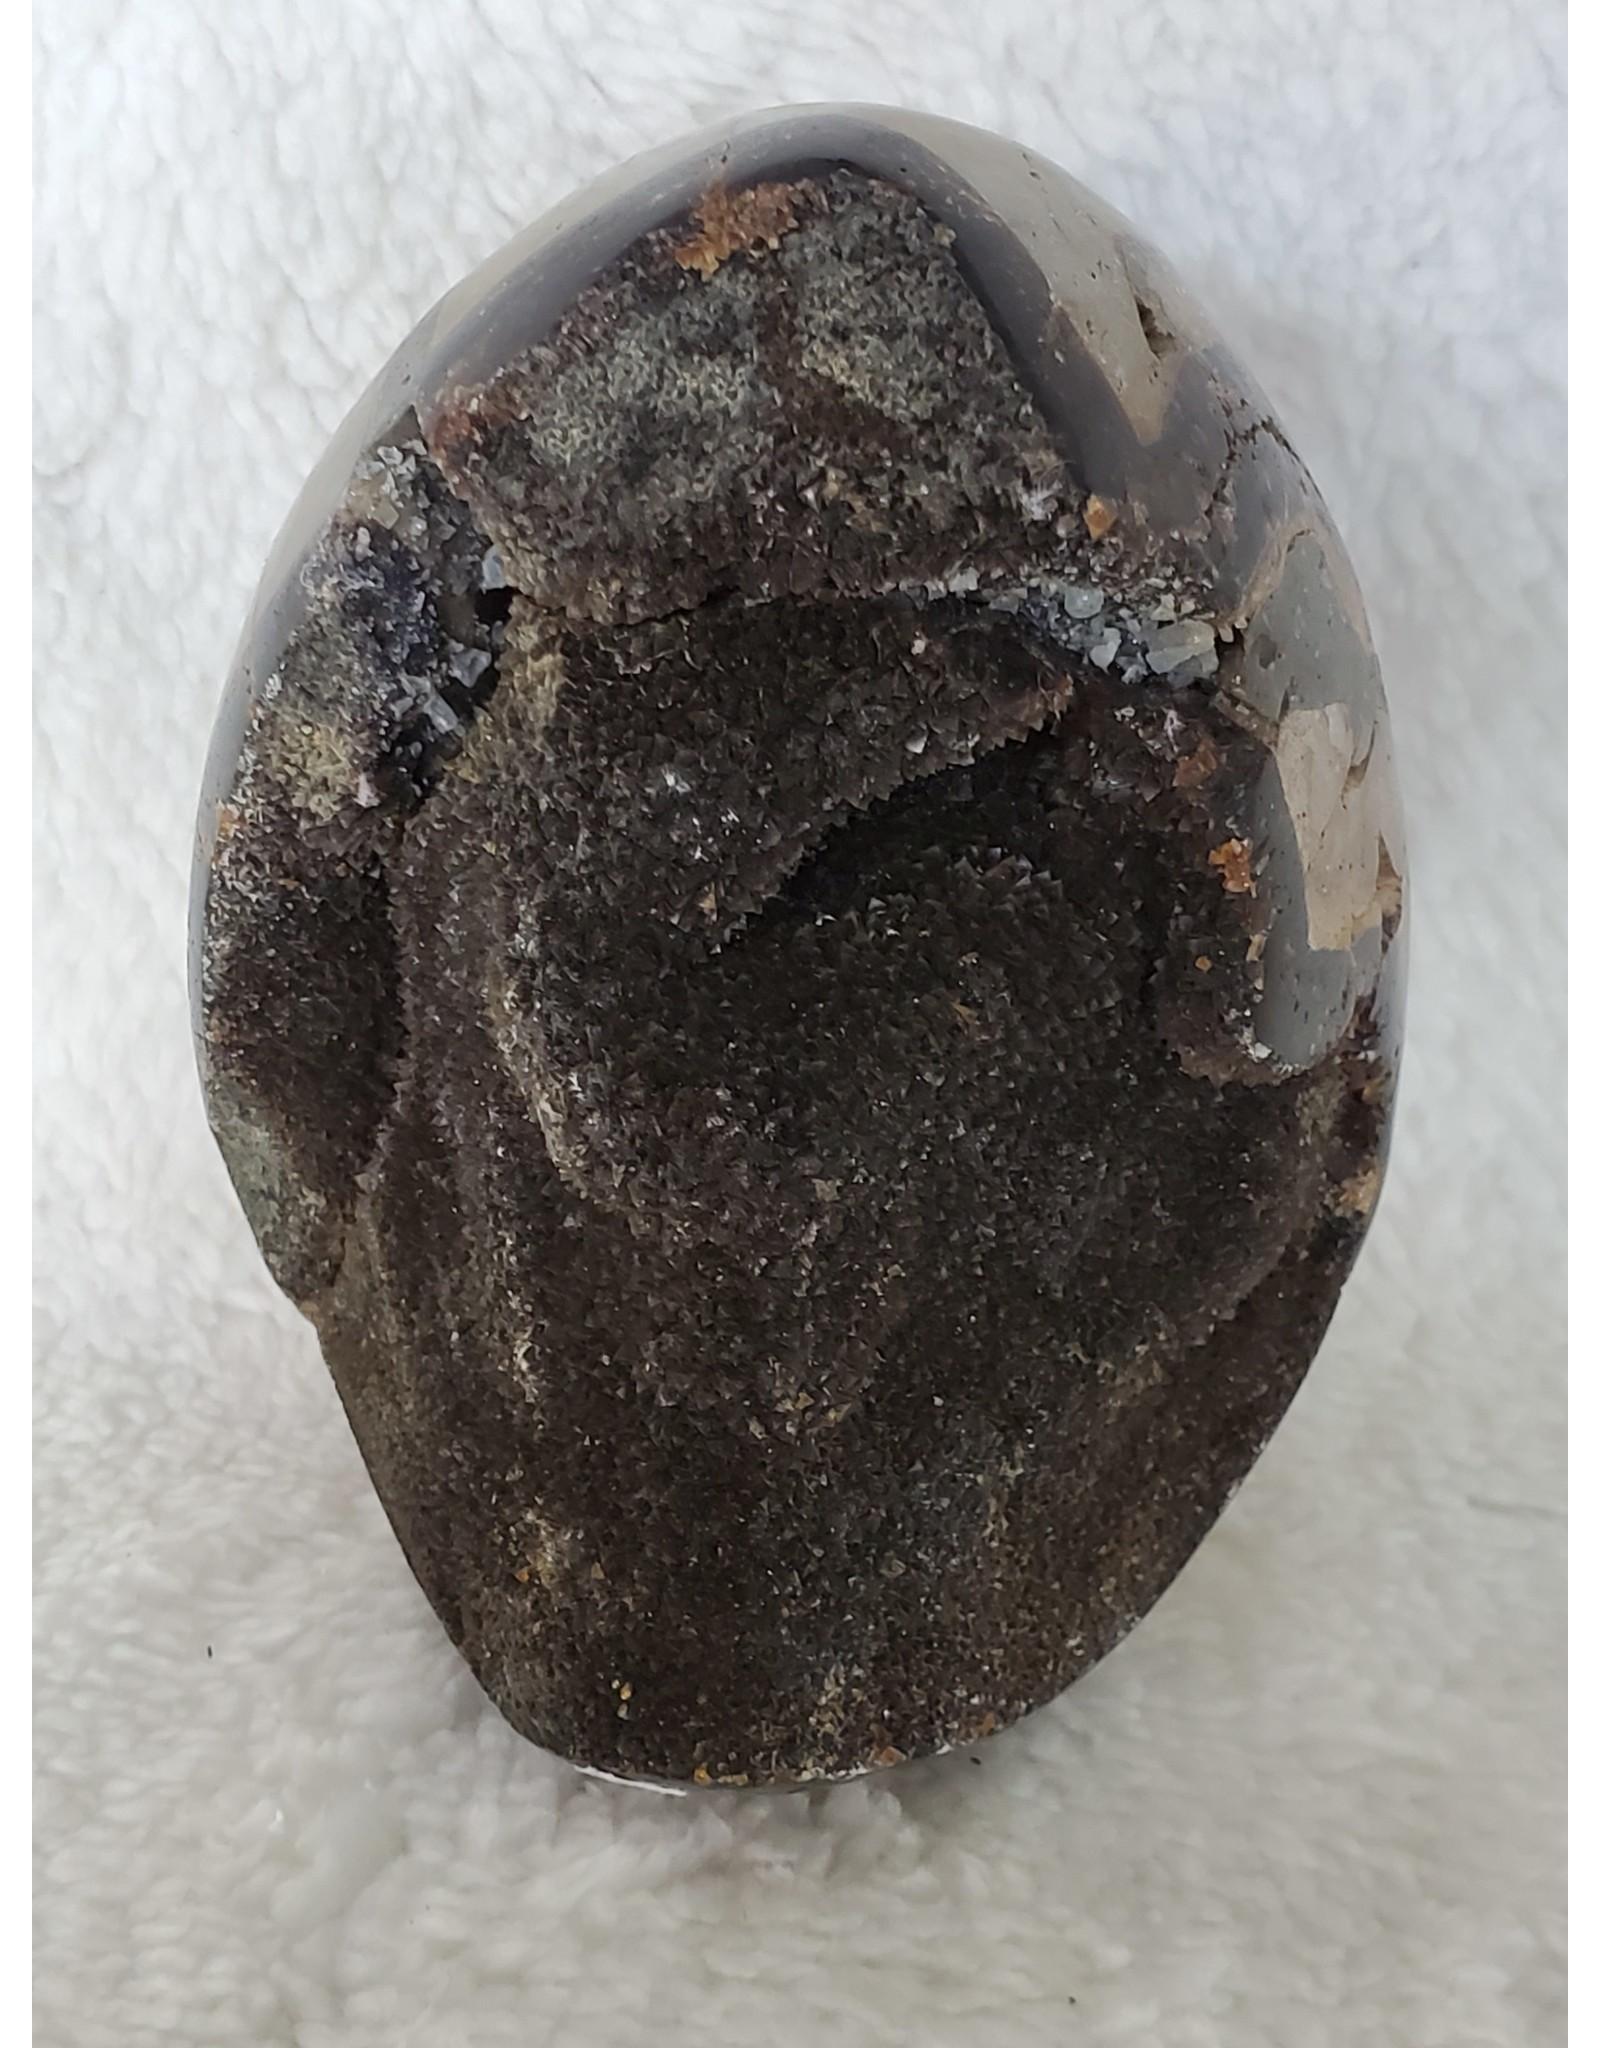 Septarian Egg - Large